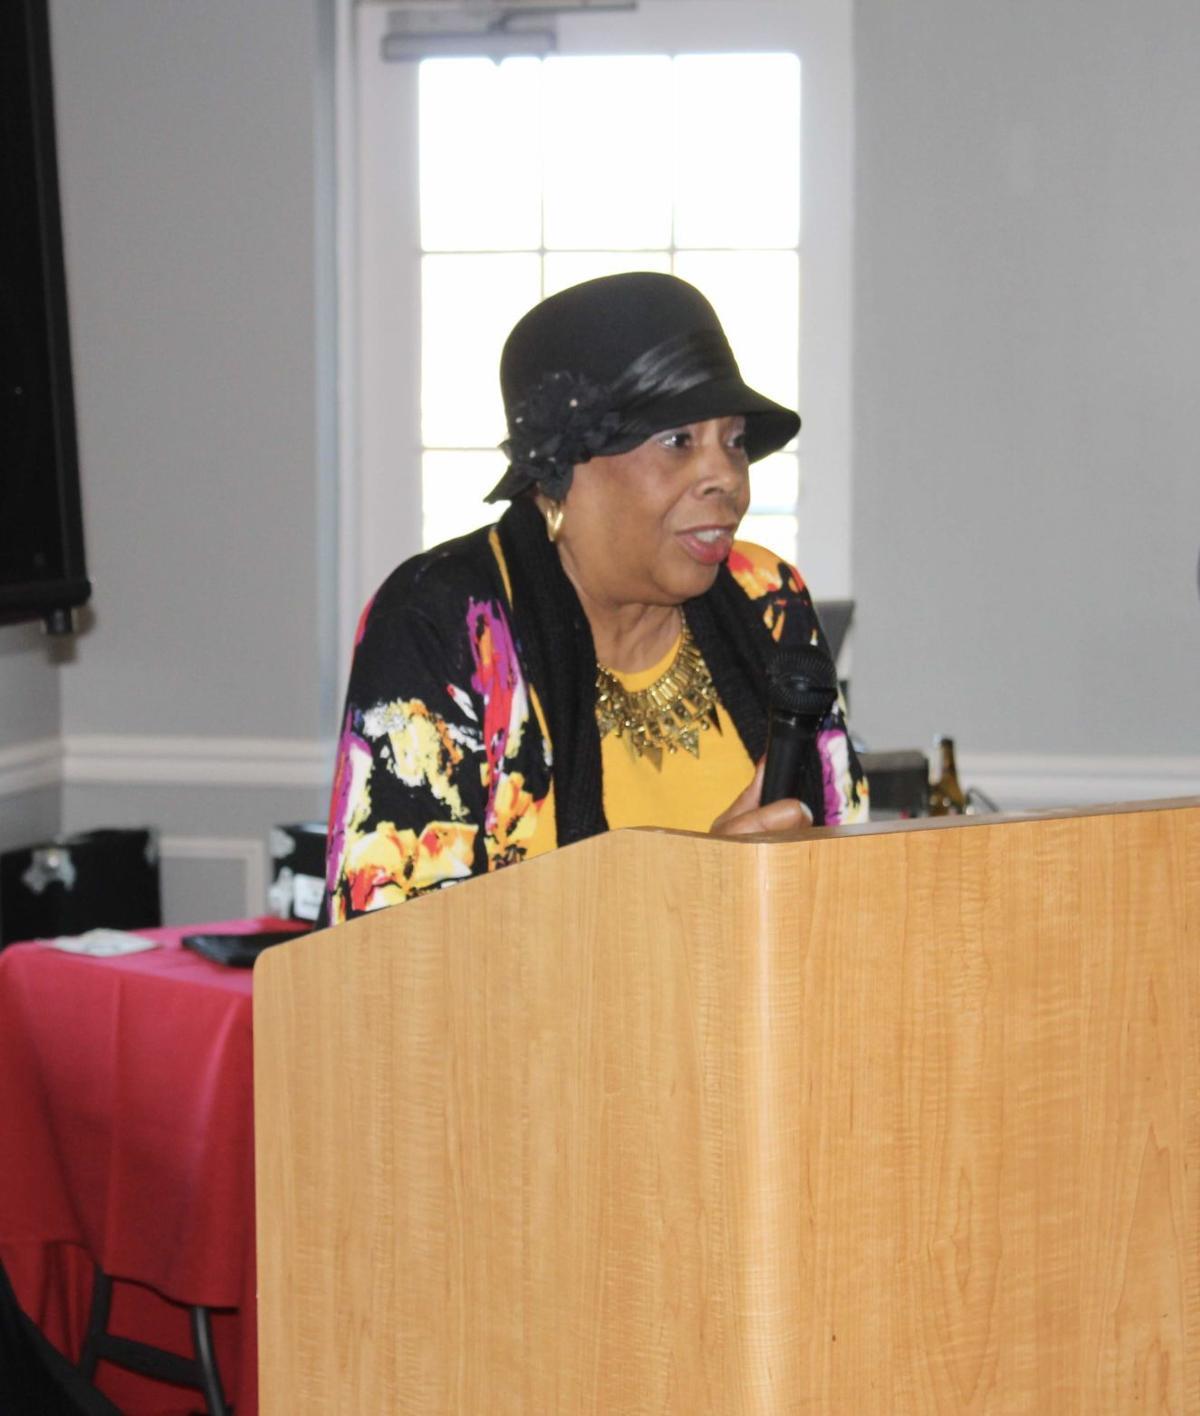 PHOTOS Surprise 80th Birthday Party For Barbara Frances Johnson